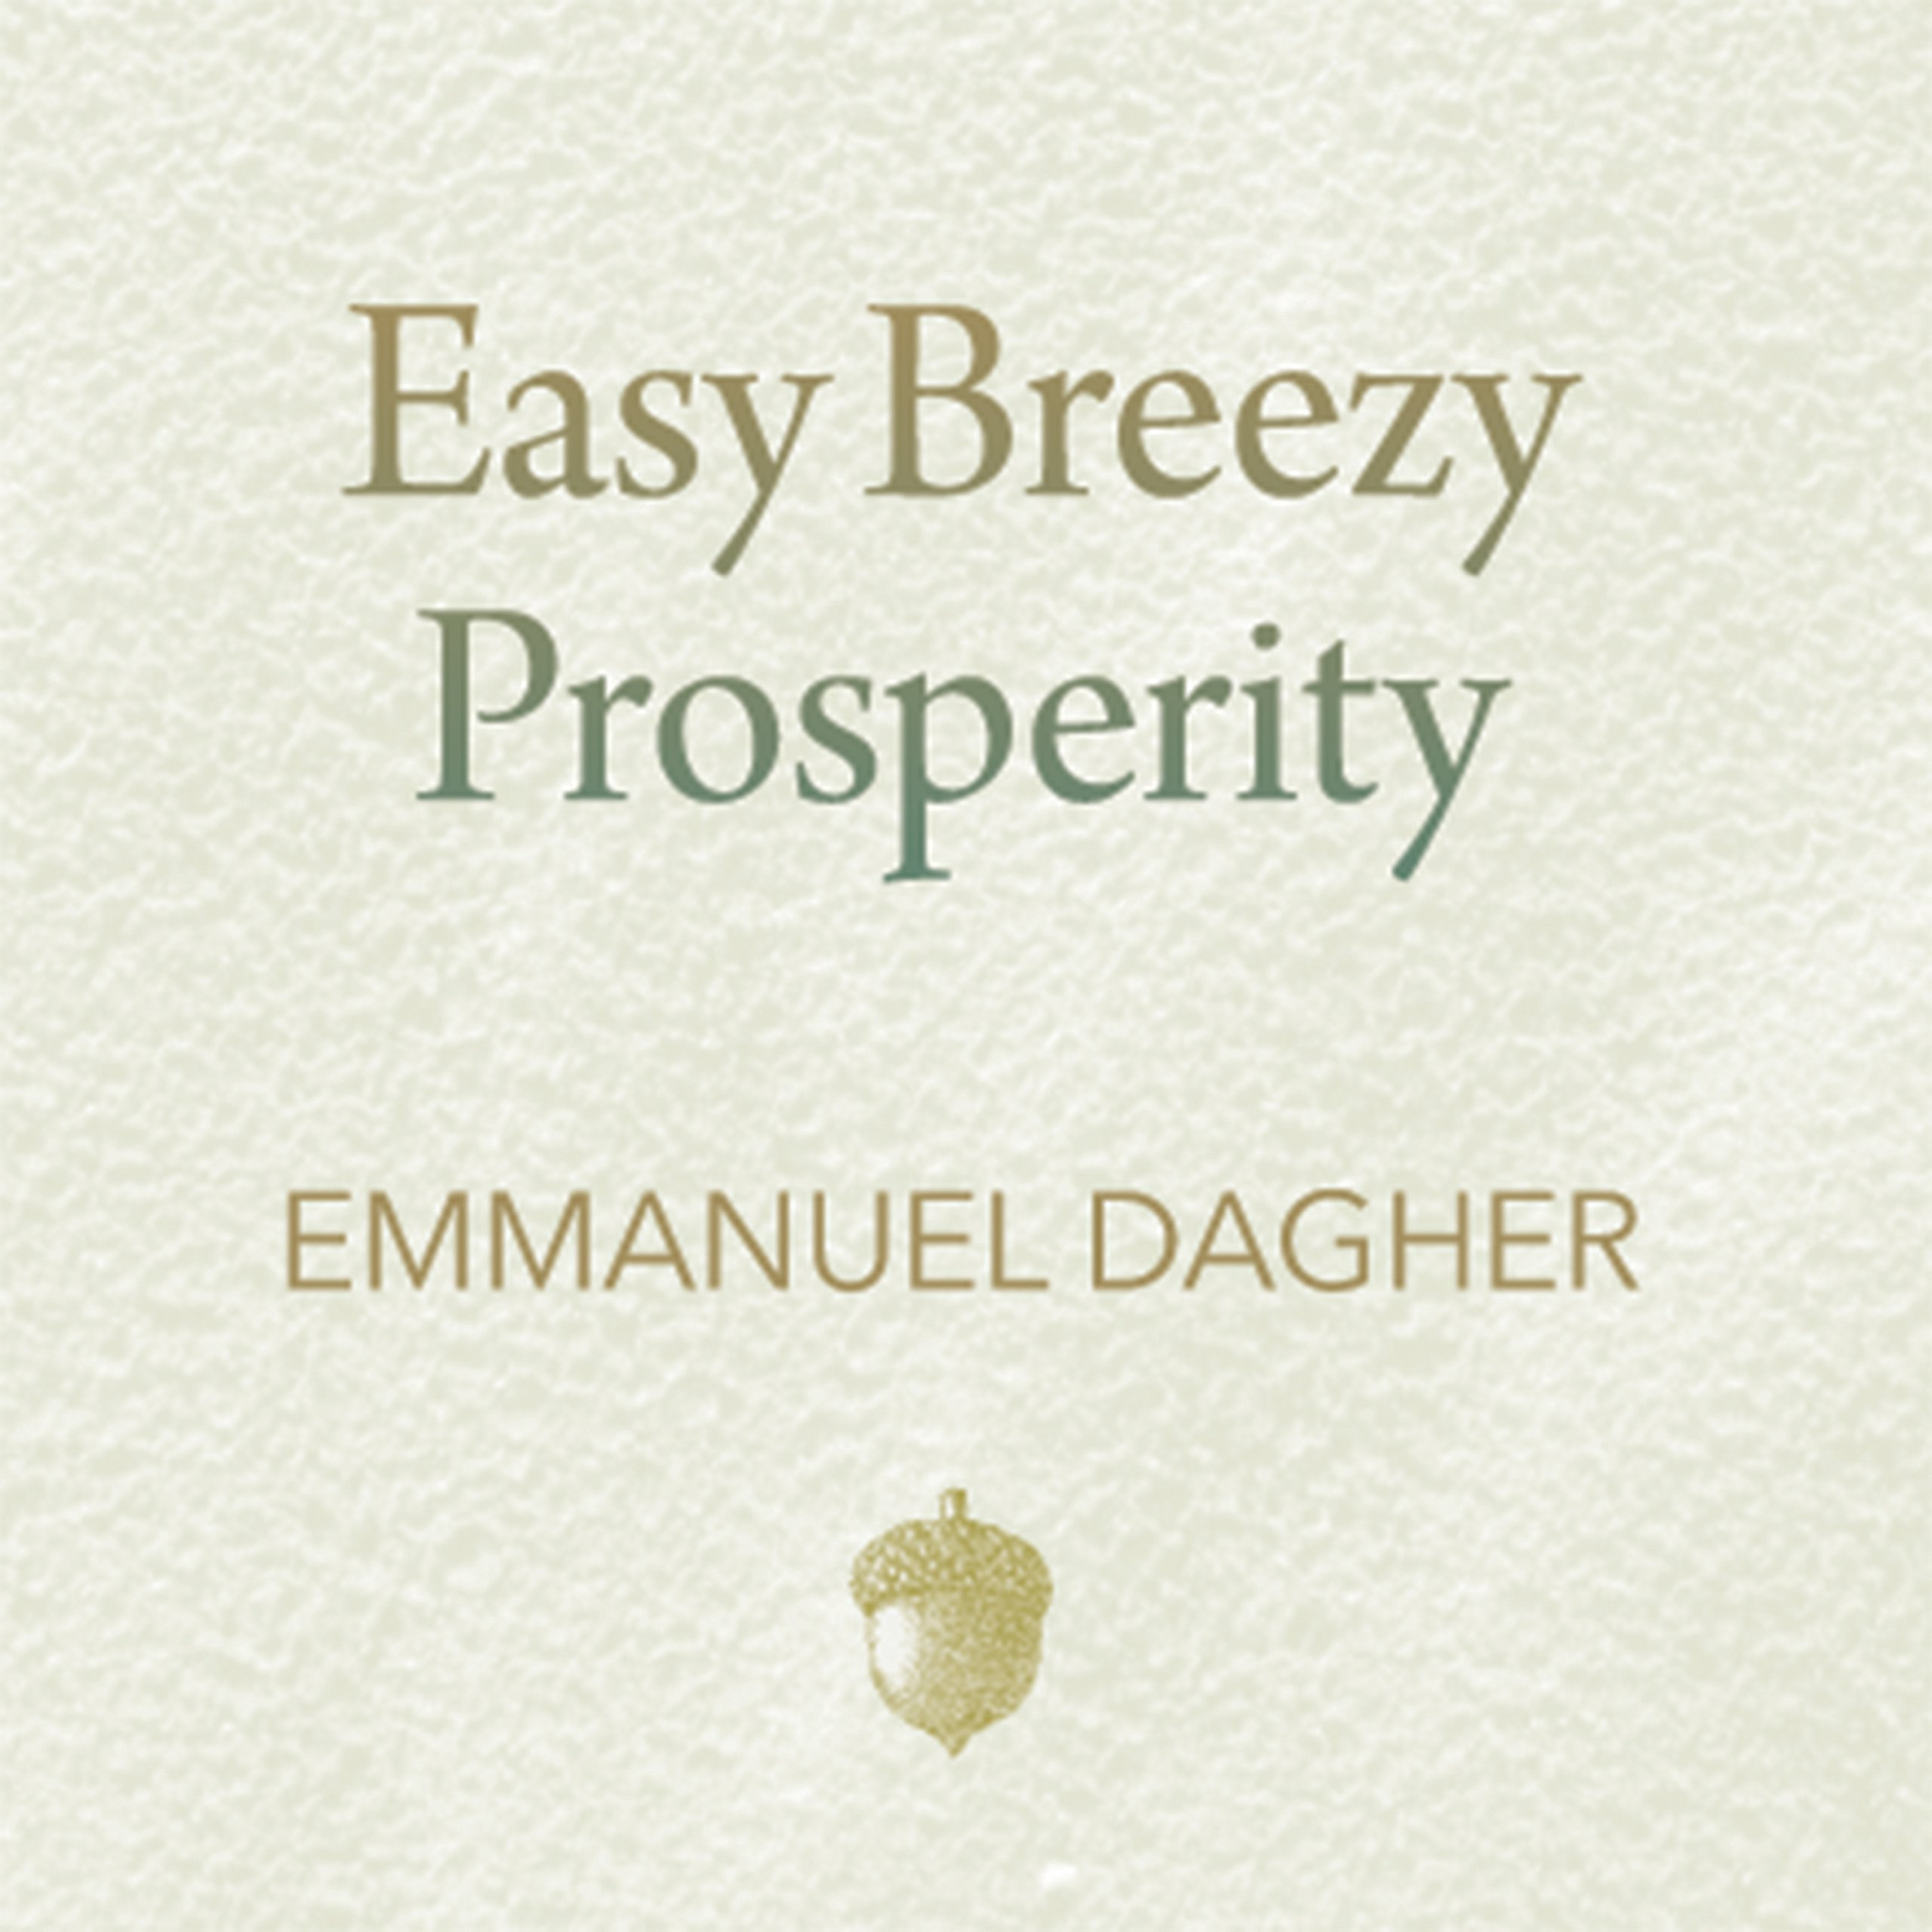 Easy Breezy Prosperity: The Five Foundations for a More Joyful, Abundant Life